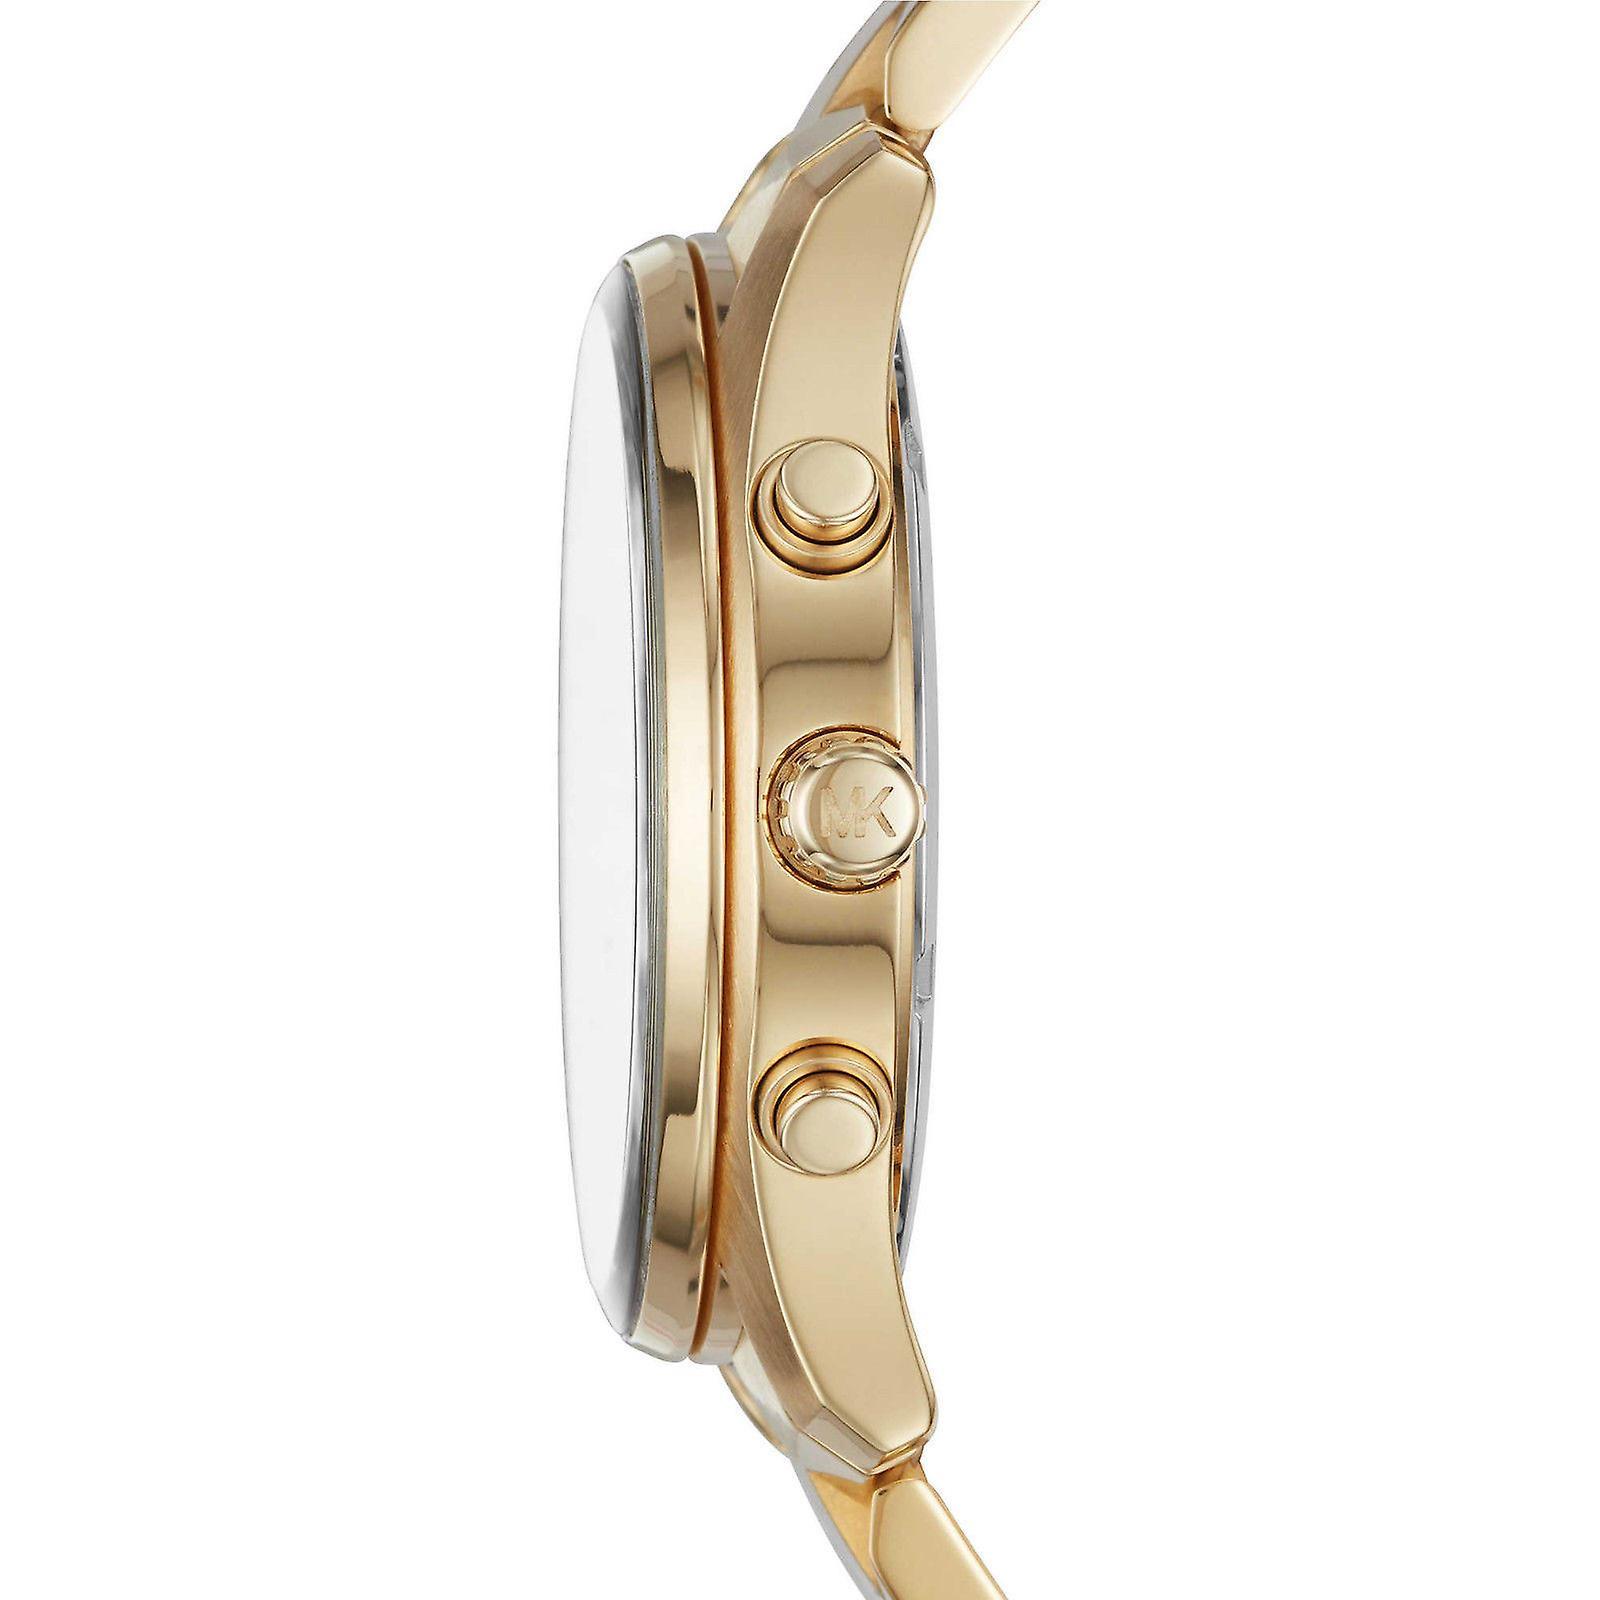 Michael Kors Mesdames Womens or Briar chronographe Wrist Watch MK6464